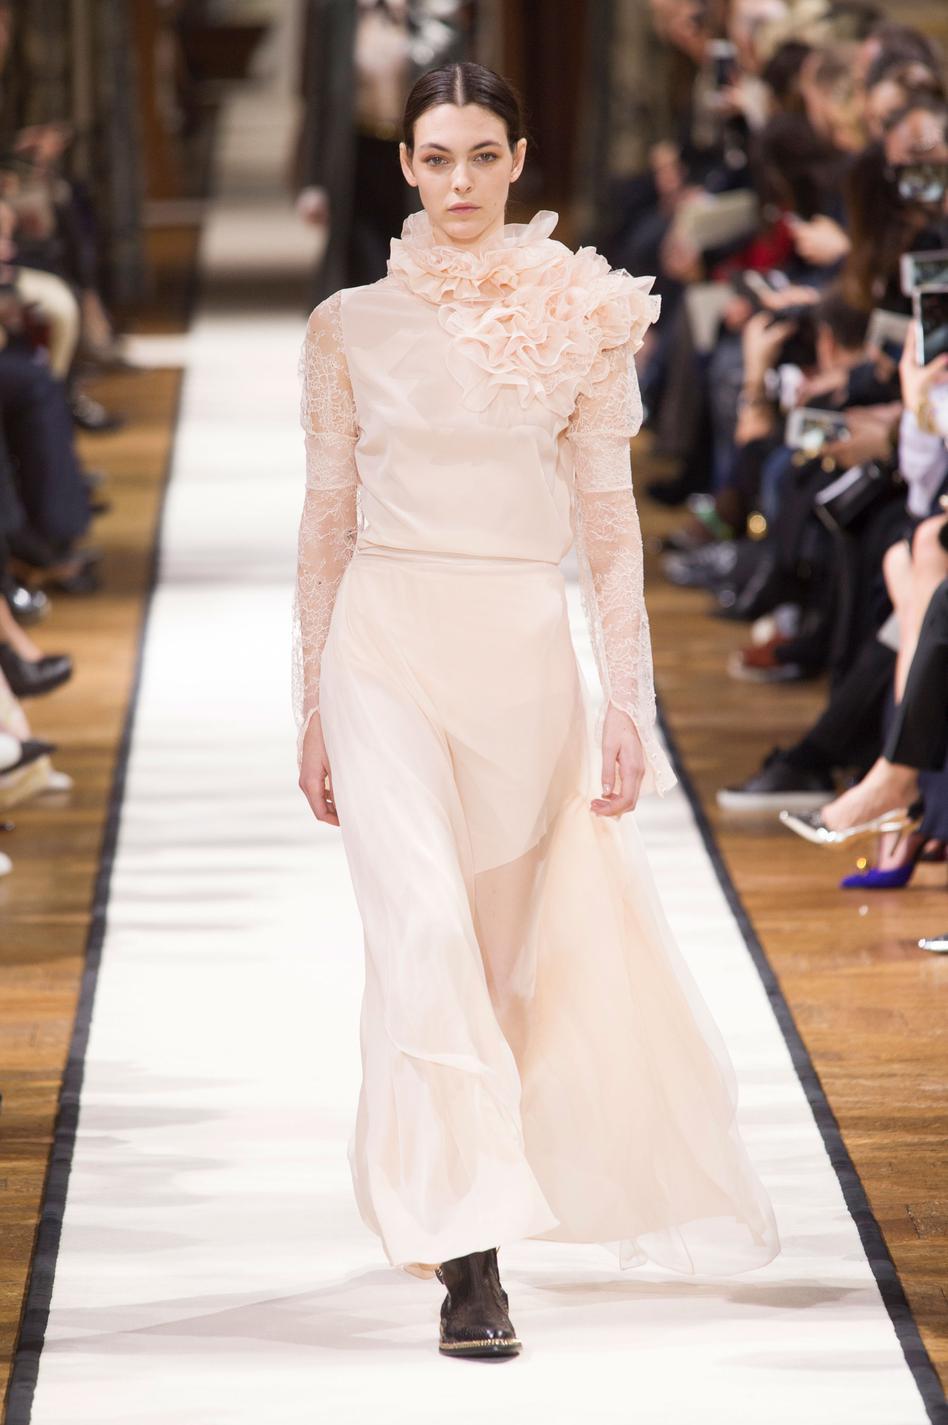 Jenny Packham Quelle tenue portera Kate Middleton au mariage de sa sœur  Pippa ?